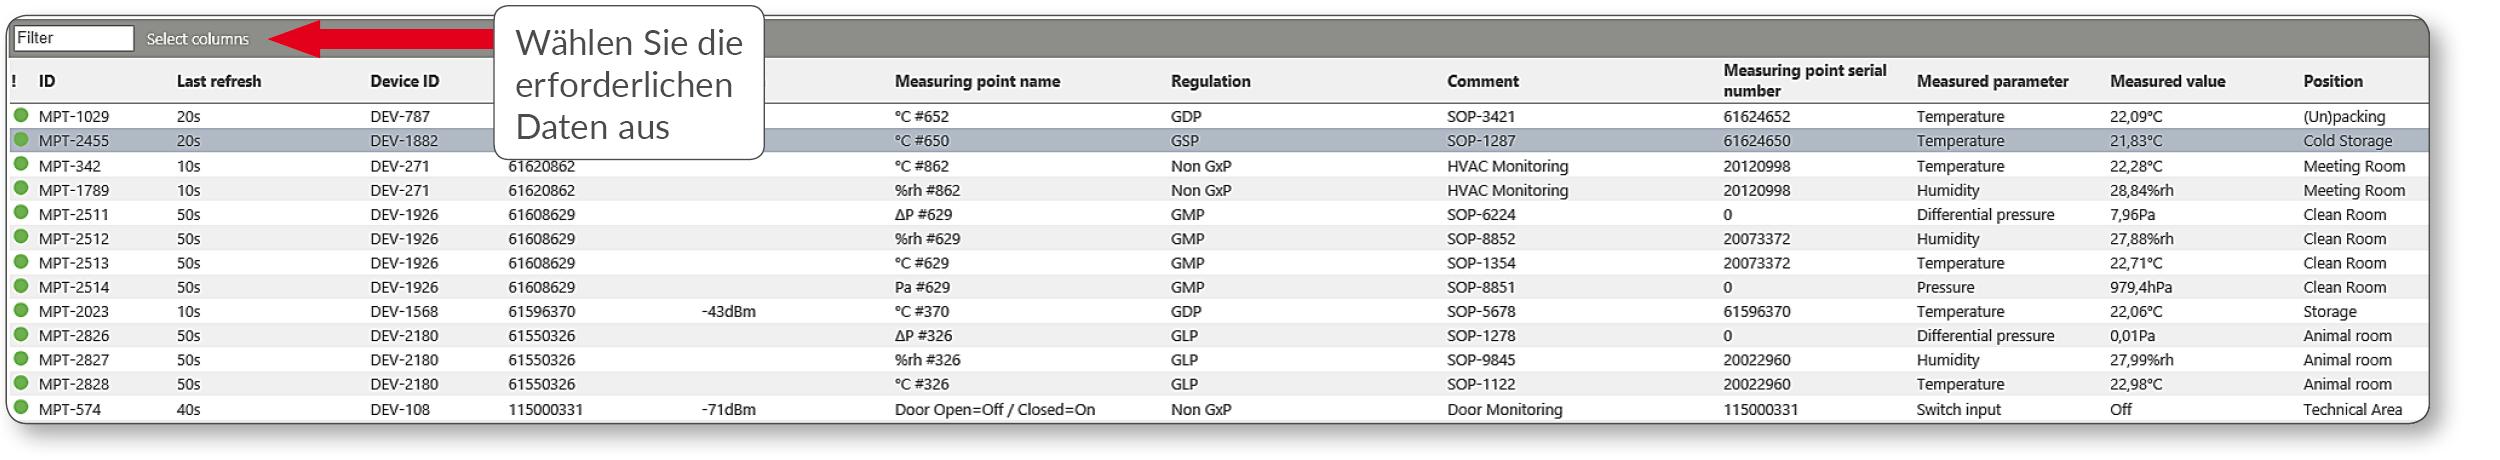 Monitoring System - Tabellenansicht